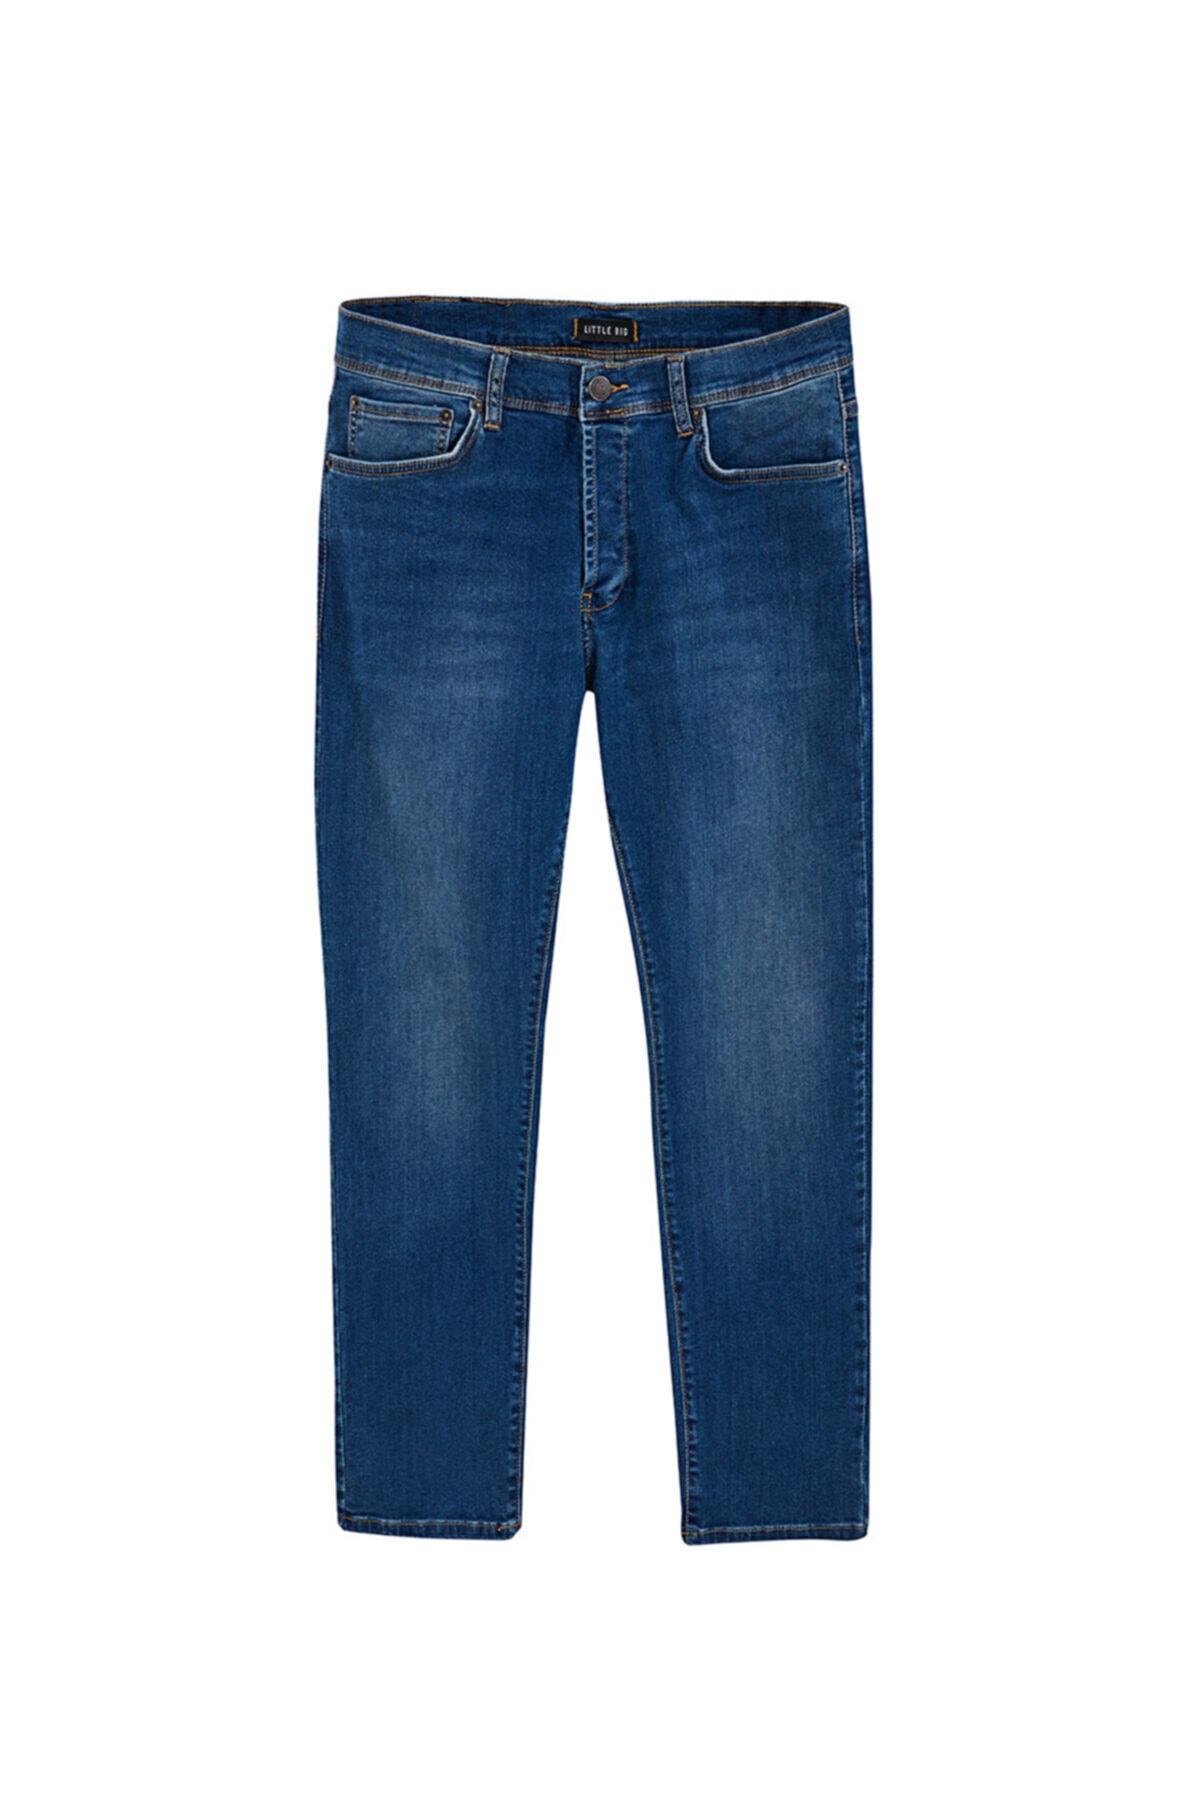 Jerard Needle Wash Pantolon